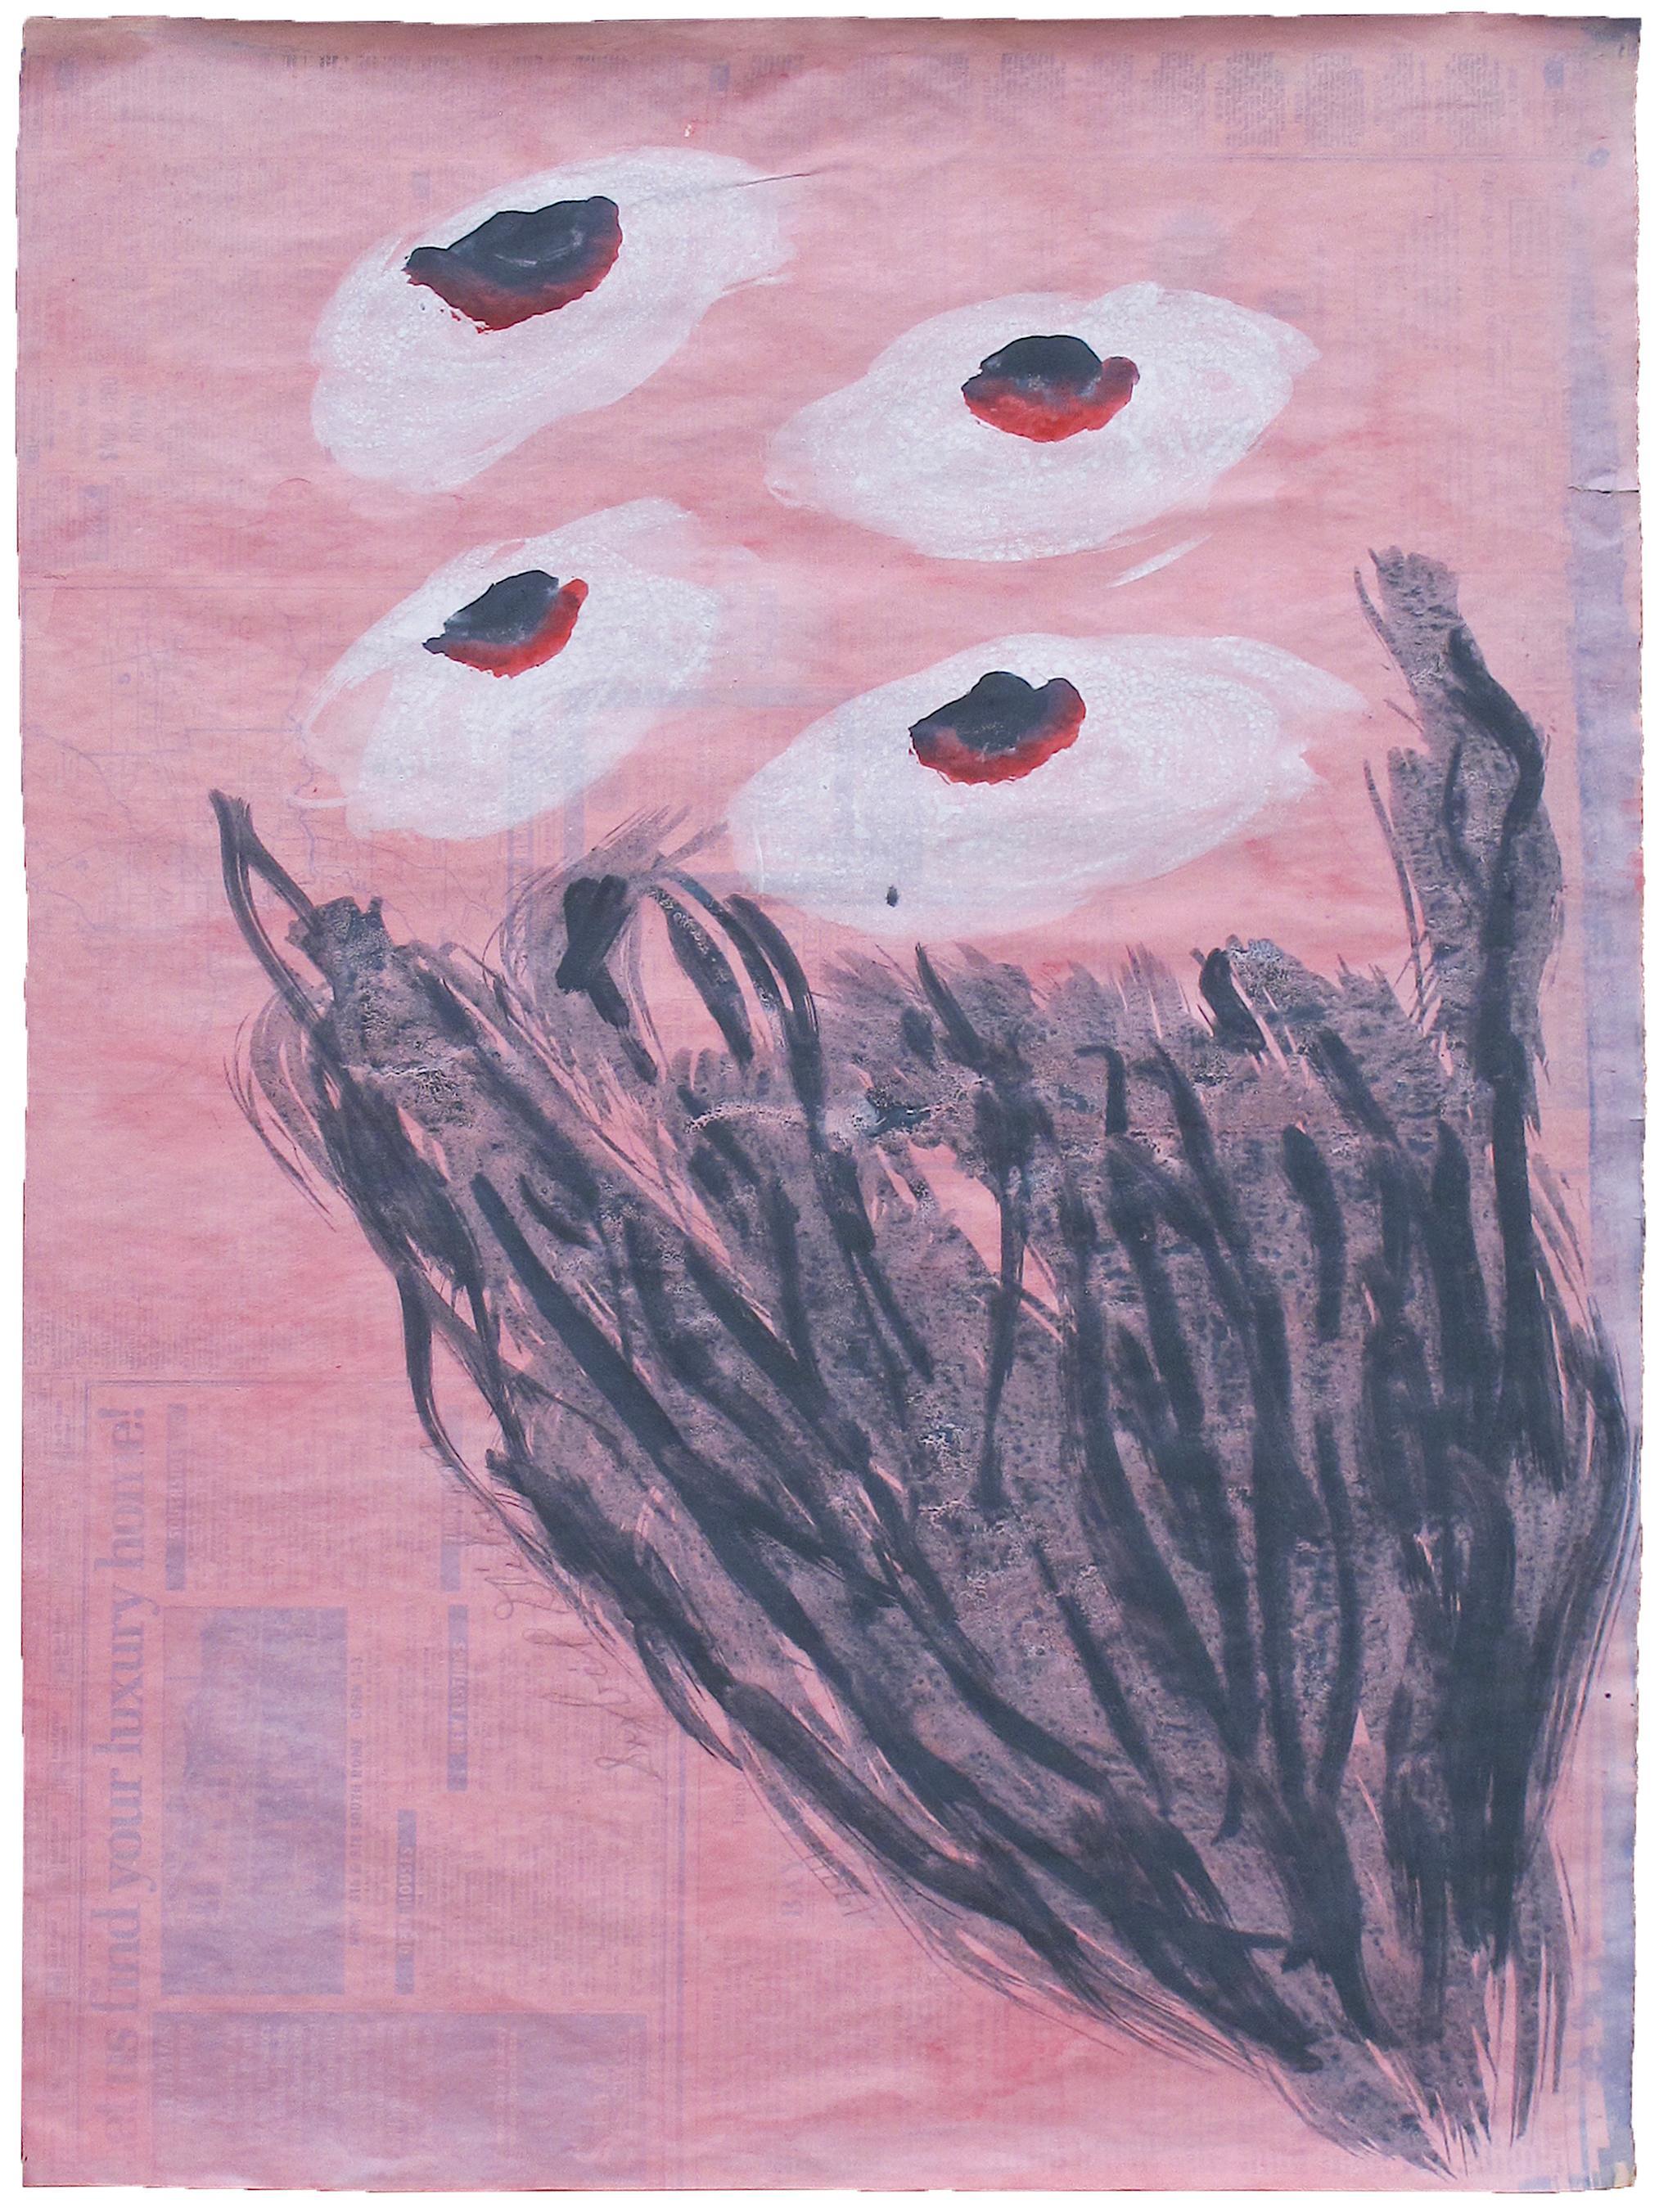 Medium Drawings and Watercolor Paintings